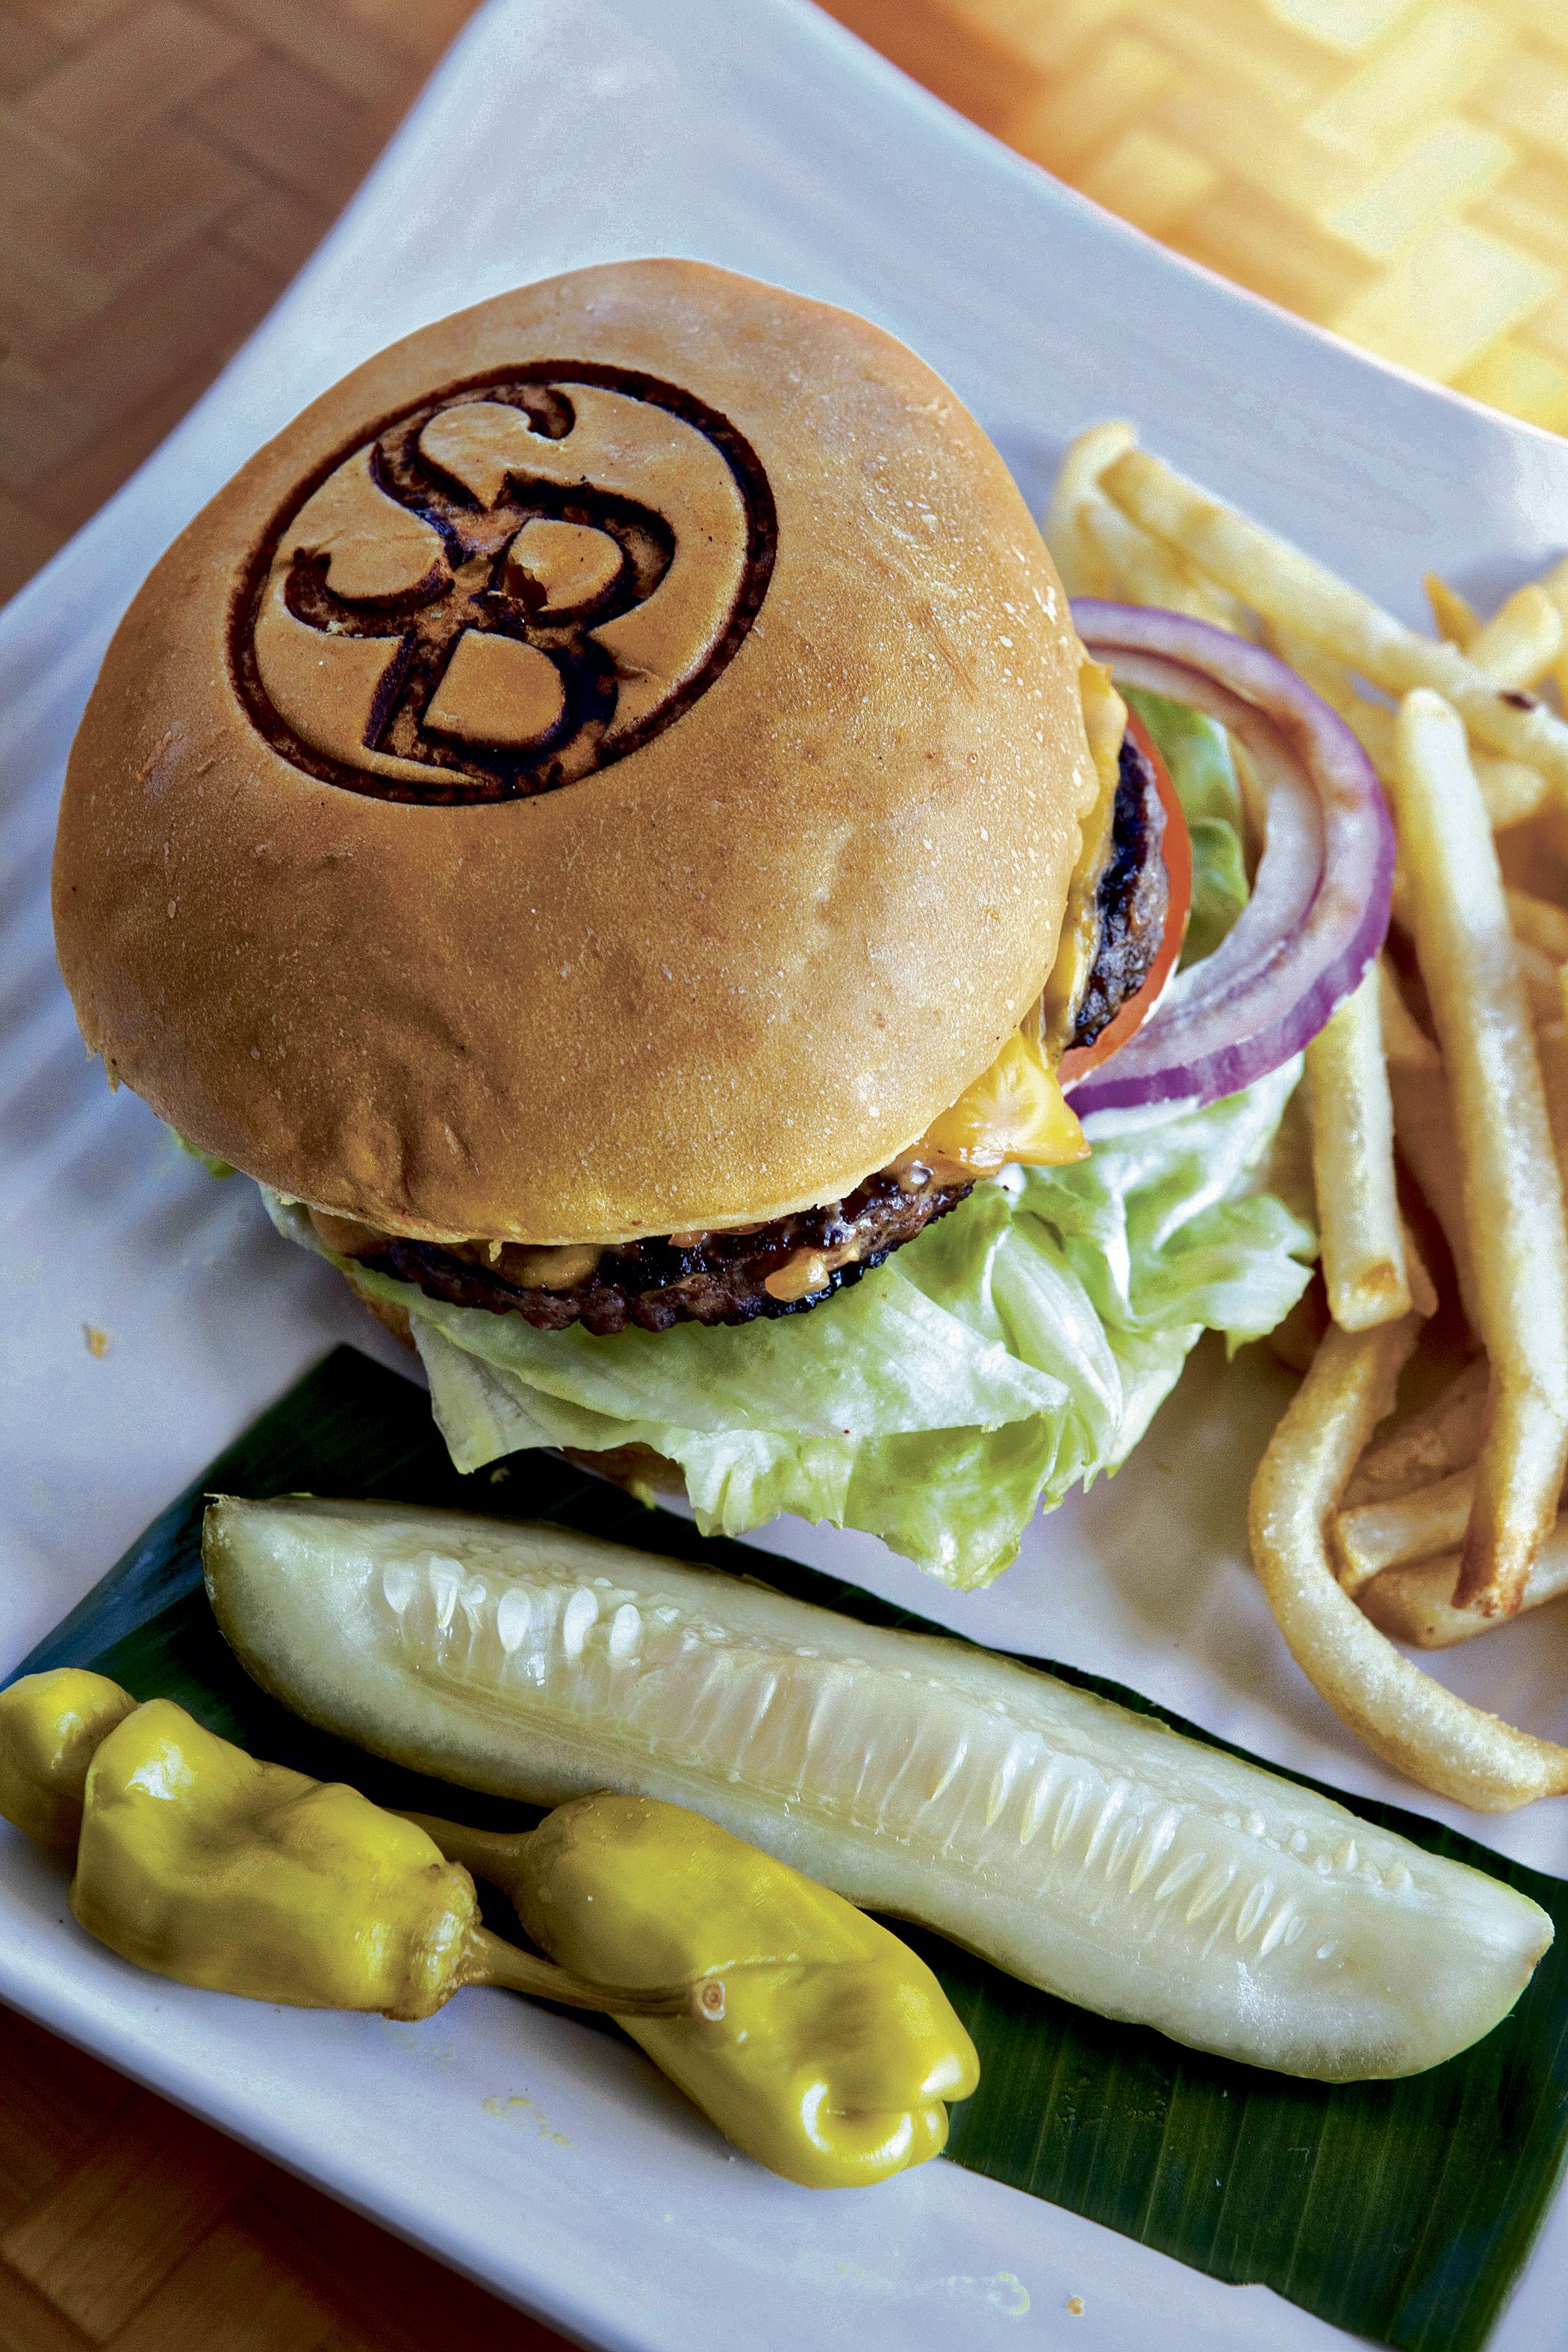 shore burger at shore bird restaurant beach bar dining out hawaii 2018 pinterest. Black Bedroom Furniture Sets. Home Design Ideas